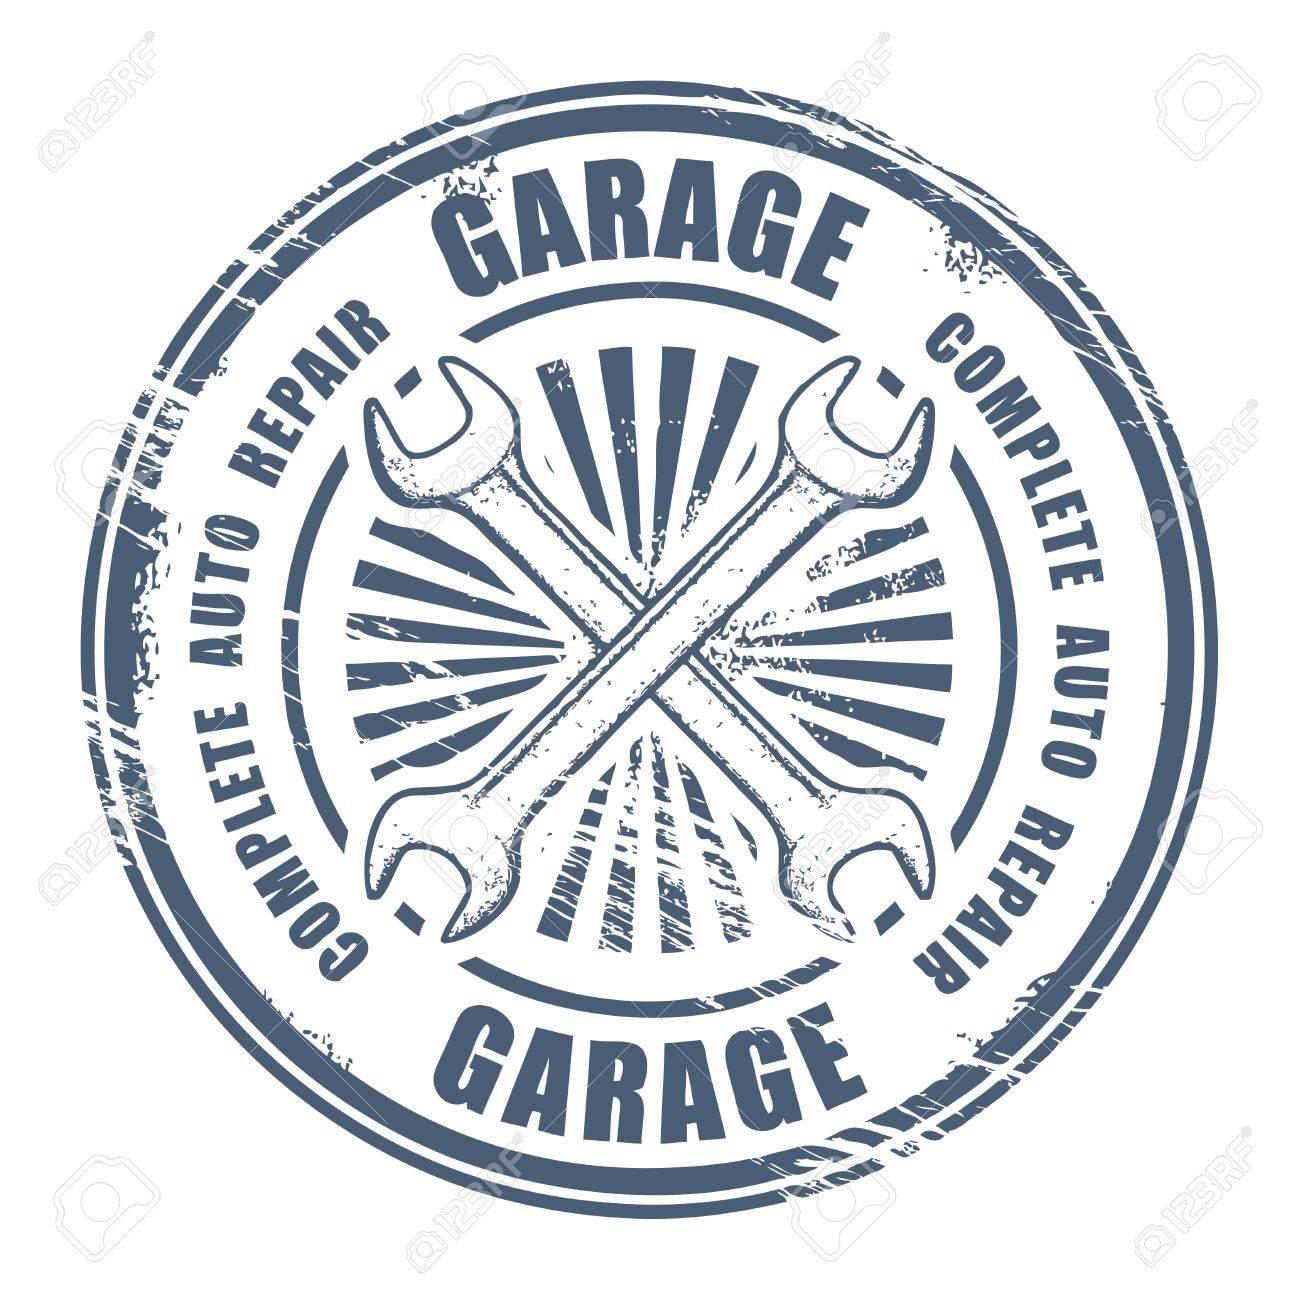 Car service garage grunge stamp Stock Vector - 15334812